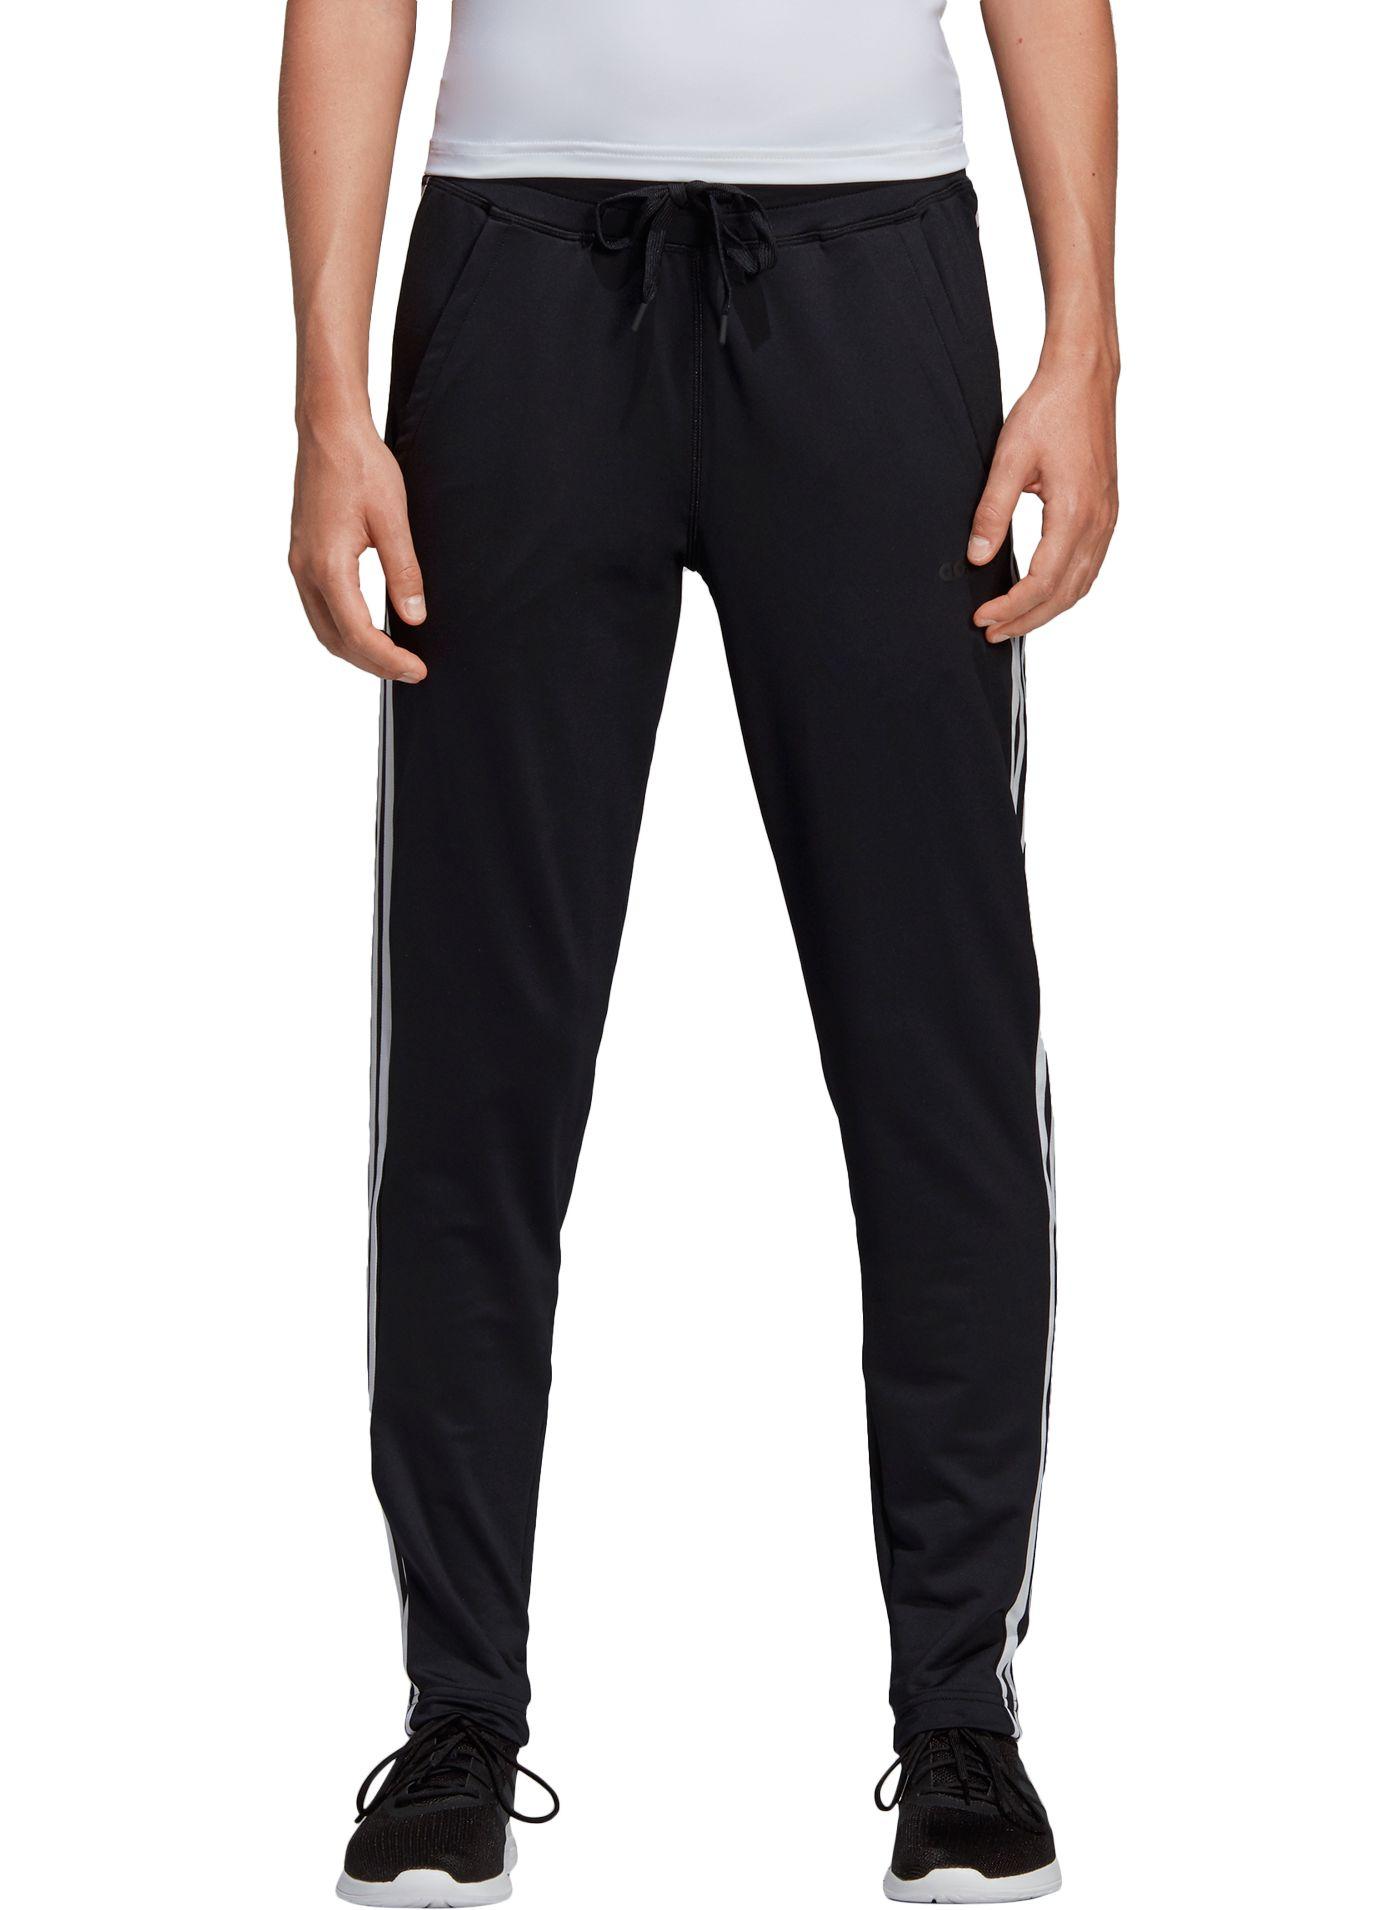 adidas Women's Design To Move 3-Stripe Pants